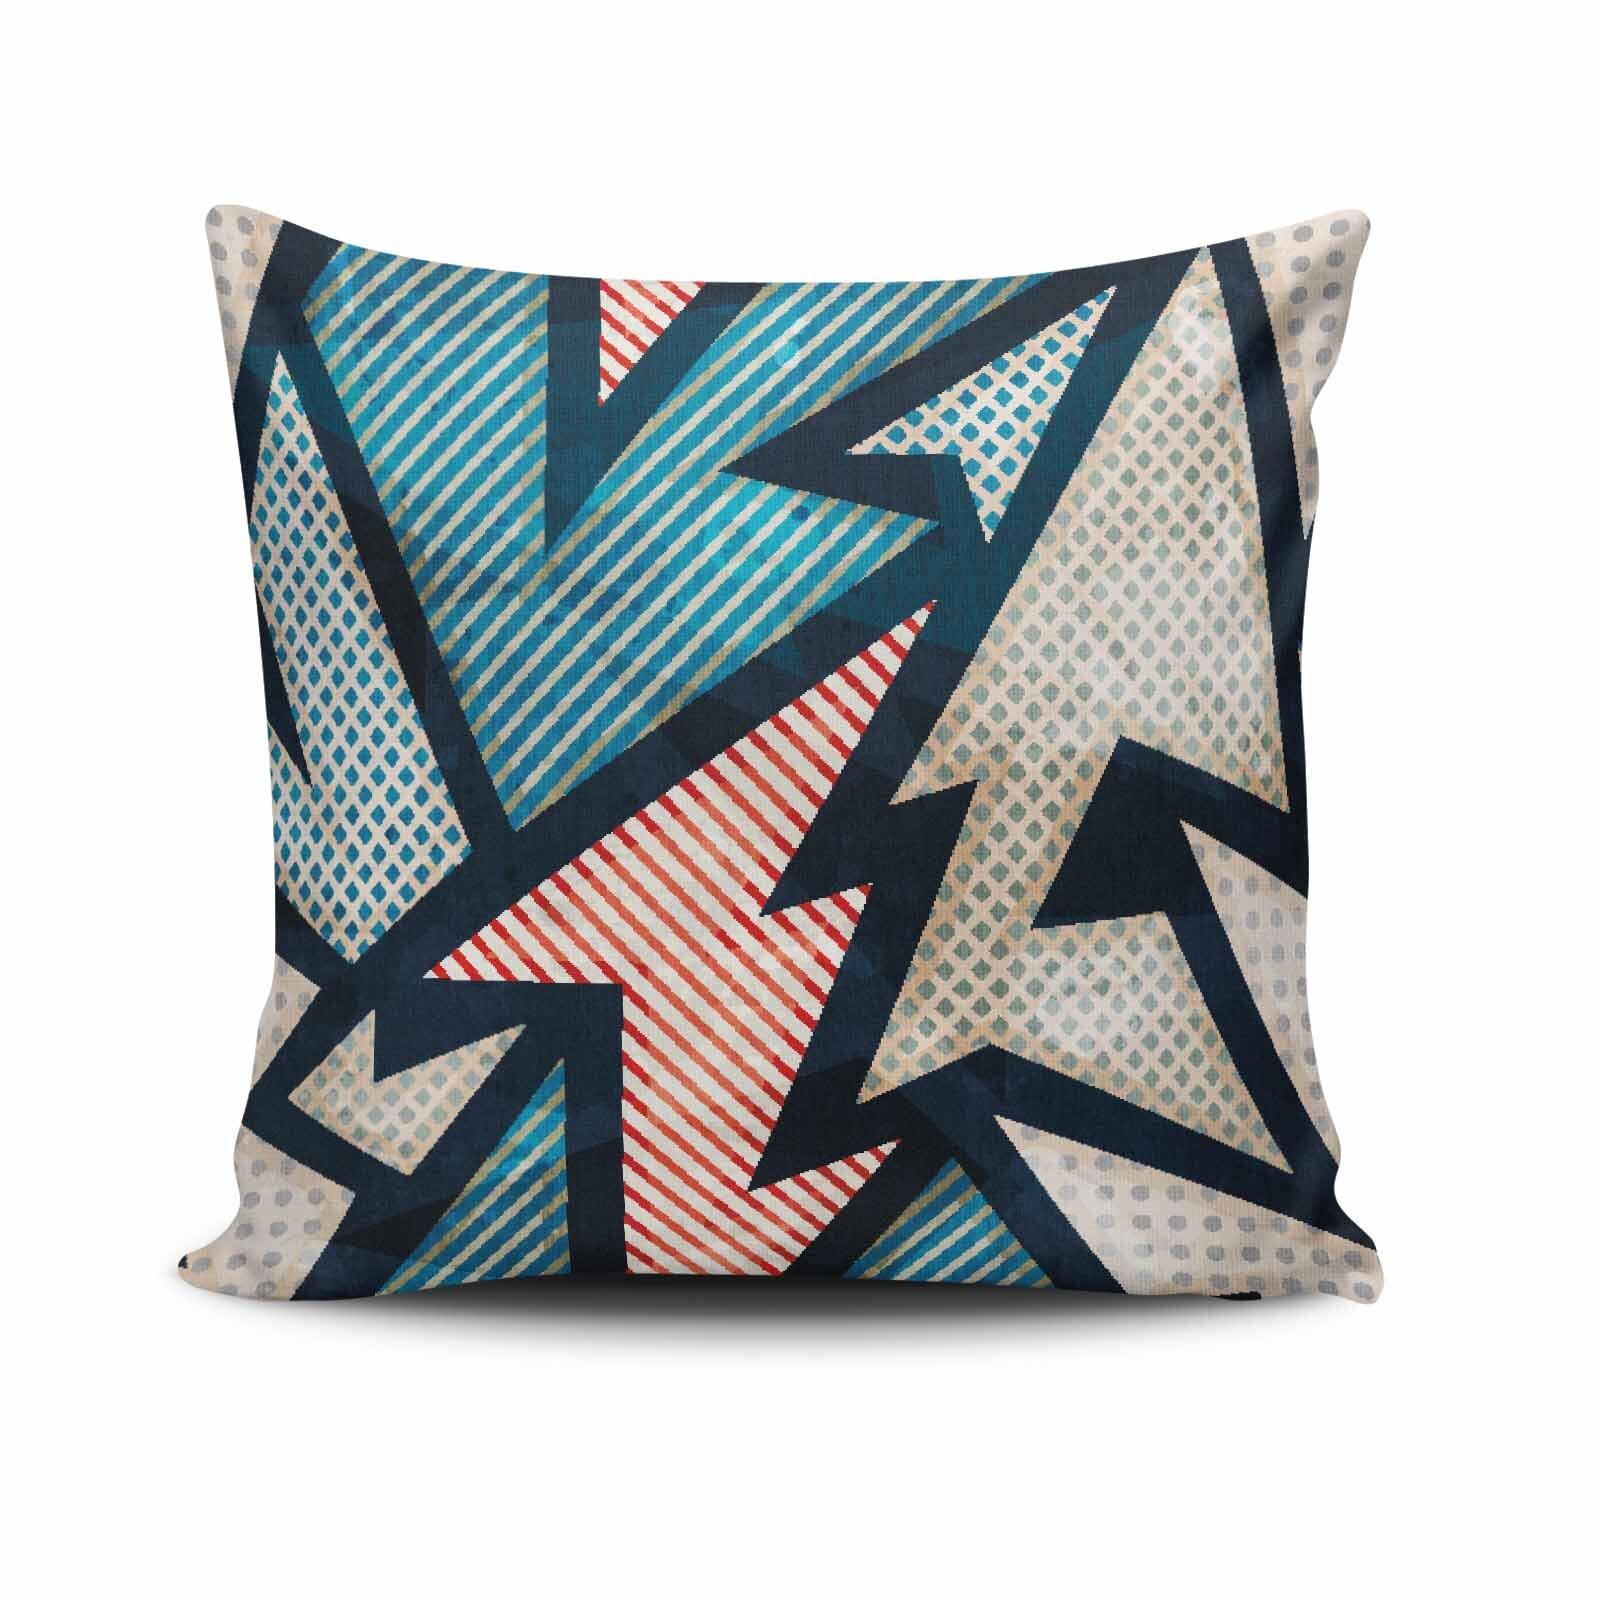 Perna decorativa Cushion Love, Dimensiune: 45 x 45 cm, Material exterior: 50% bumbac / 50% poliester 768CLV0119